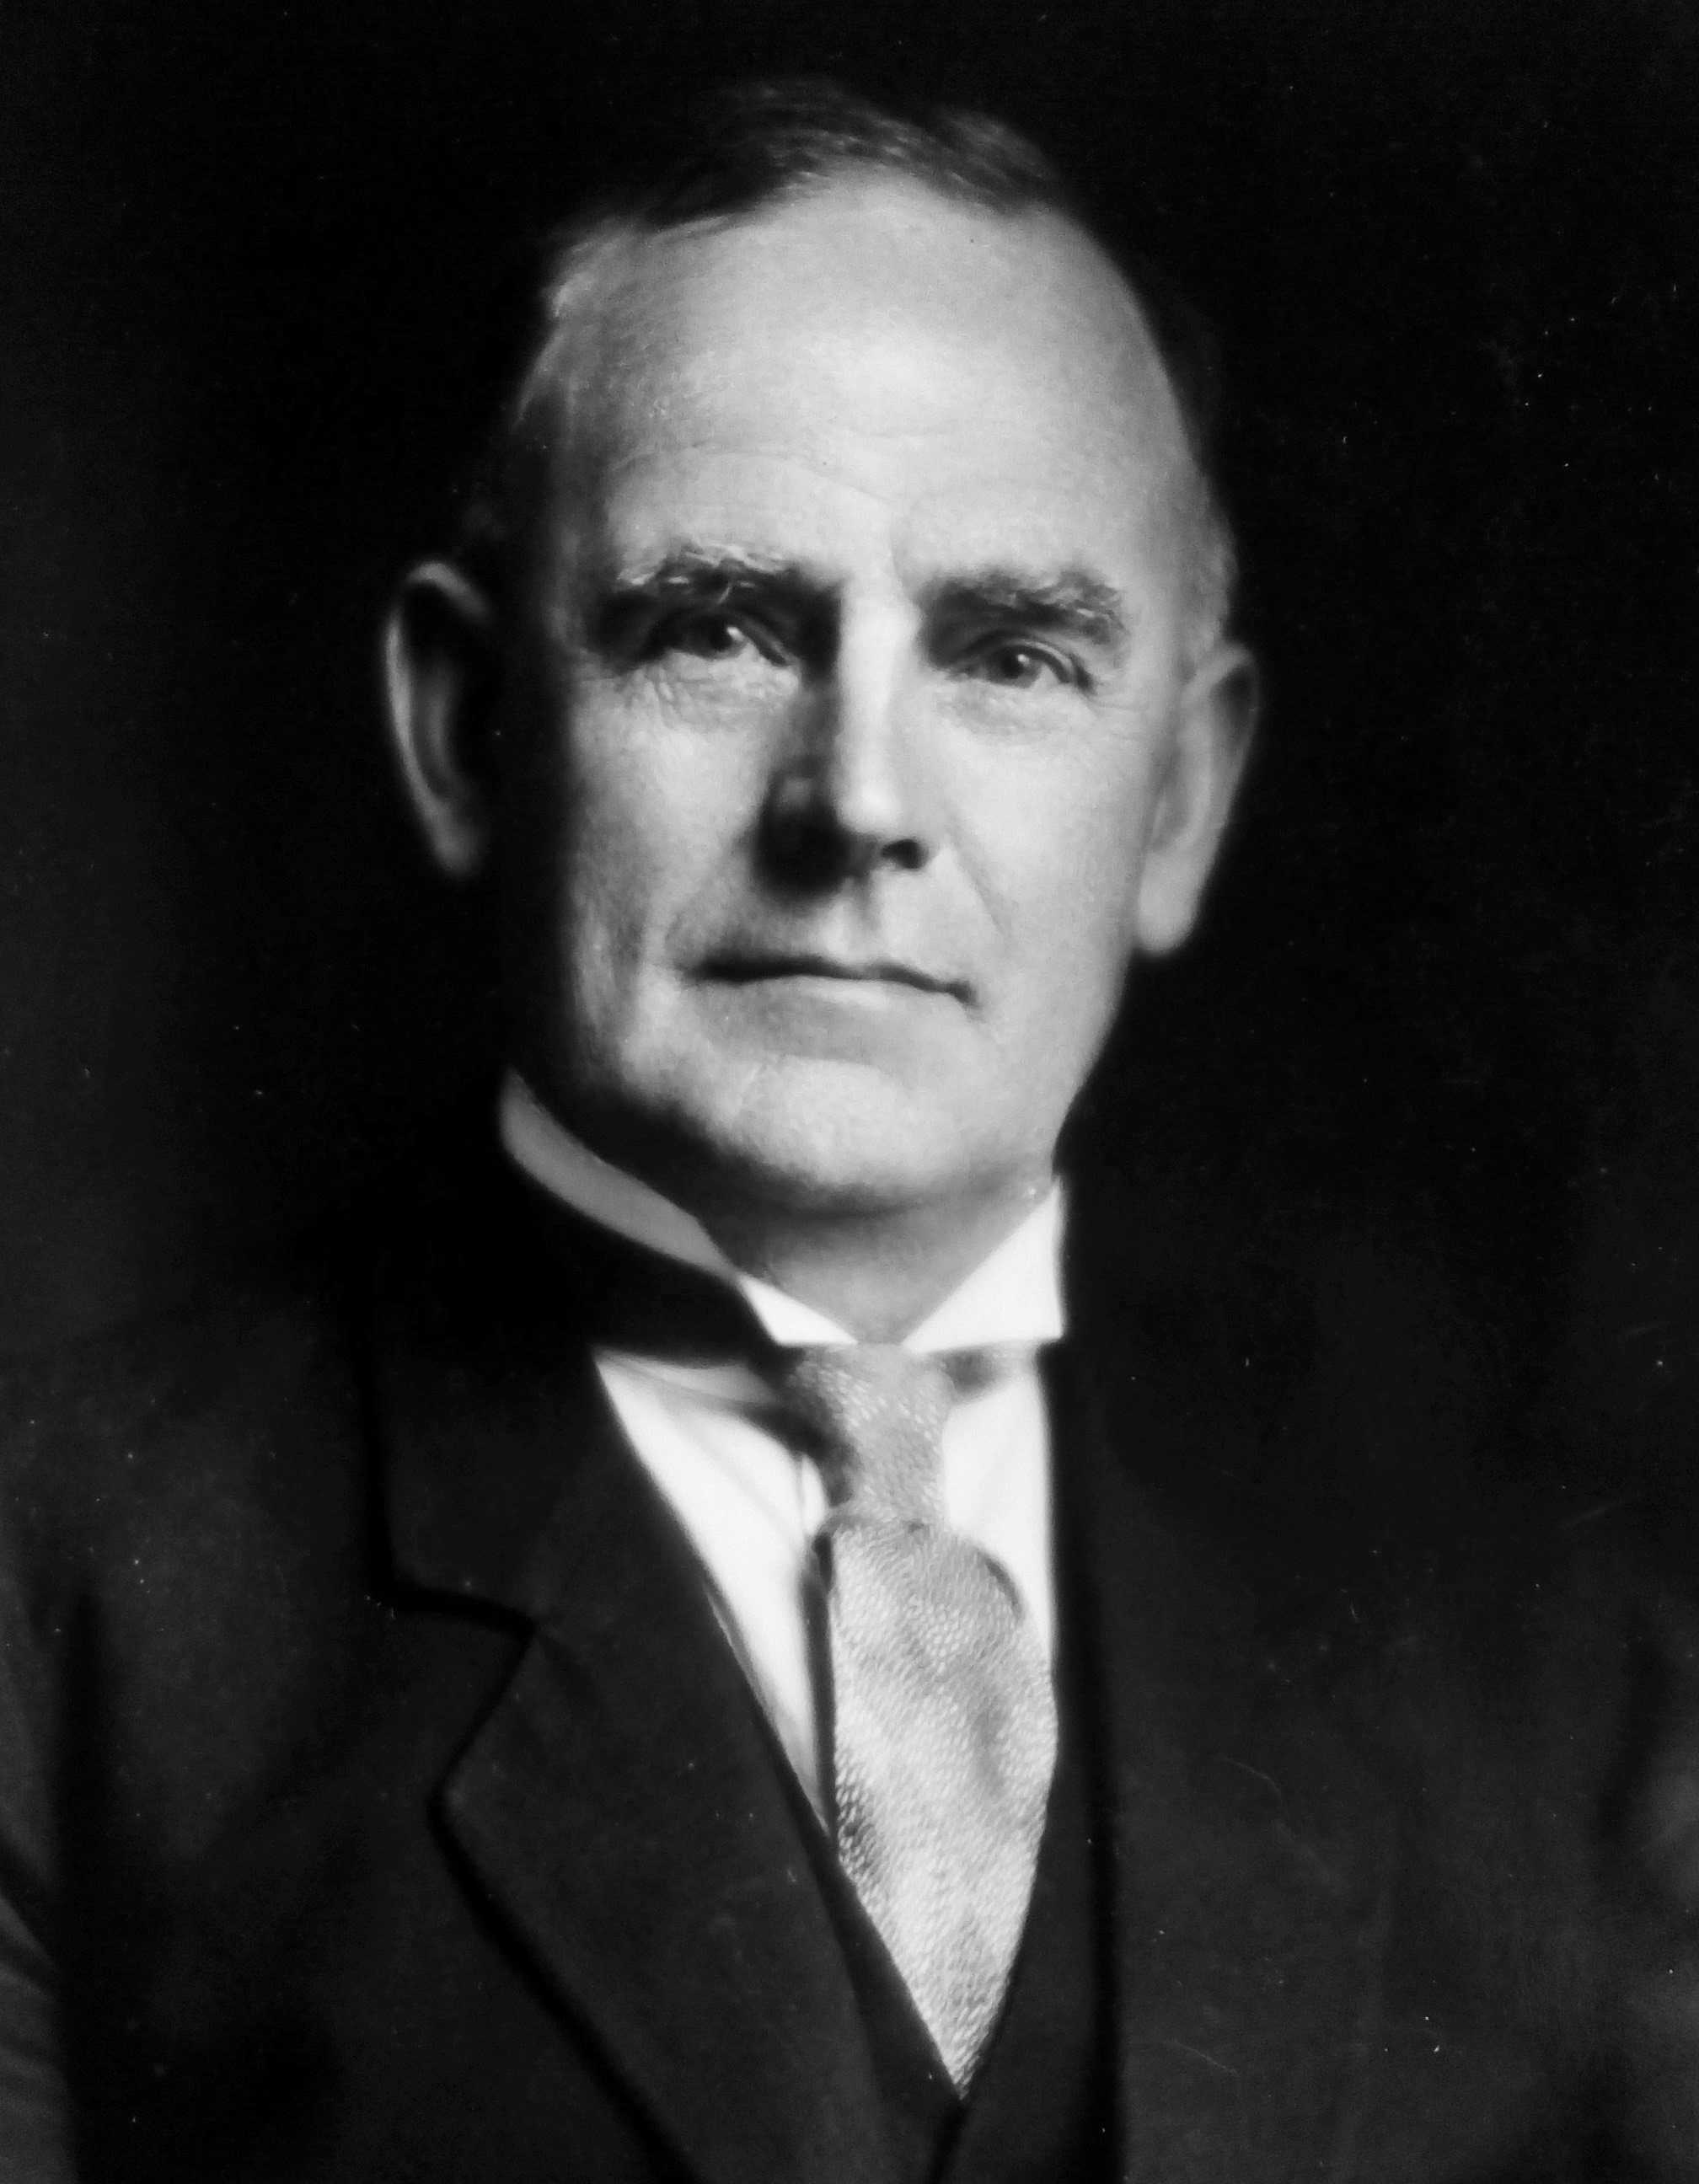 Bill Jordan (politician) New Zealand politician